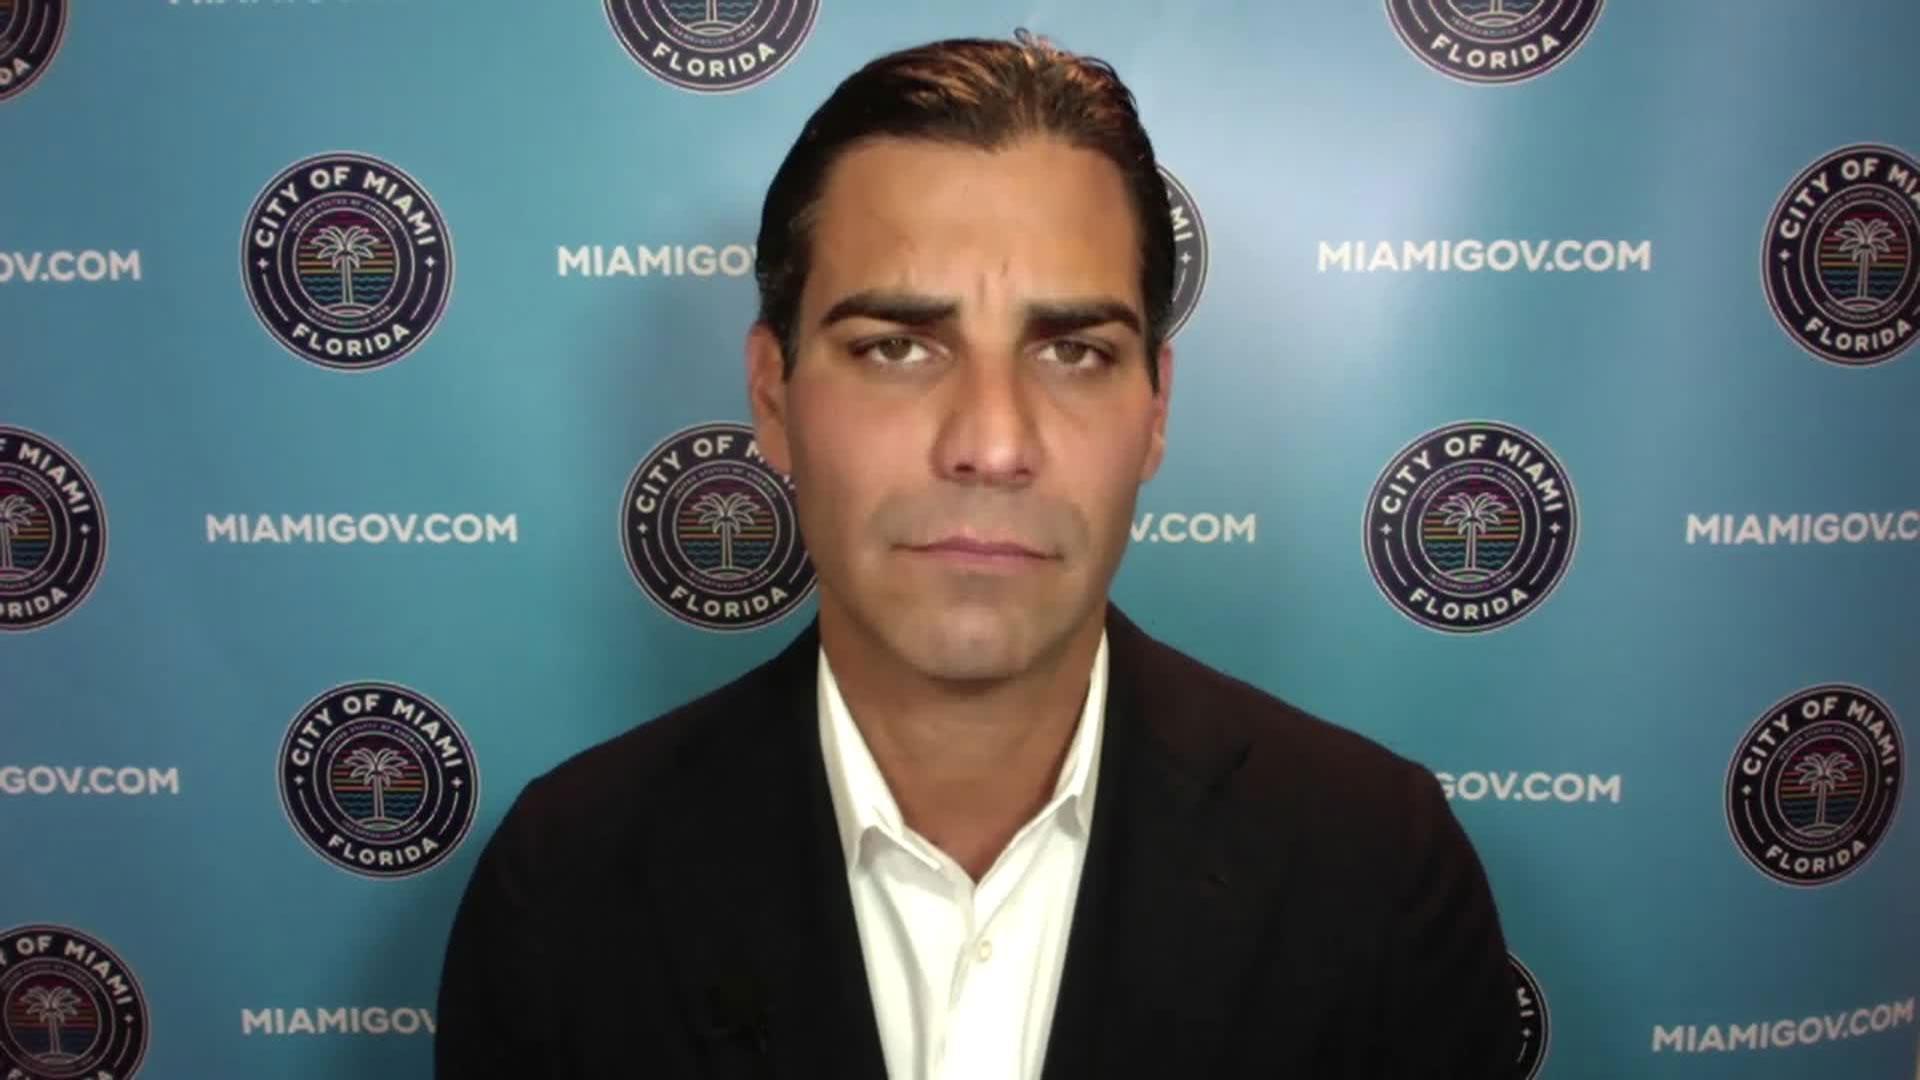 Miami Mayor Francis Suarez speaks with CNN on Saturday, September 26.